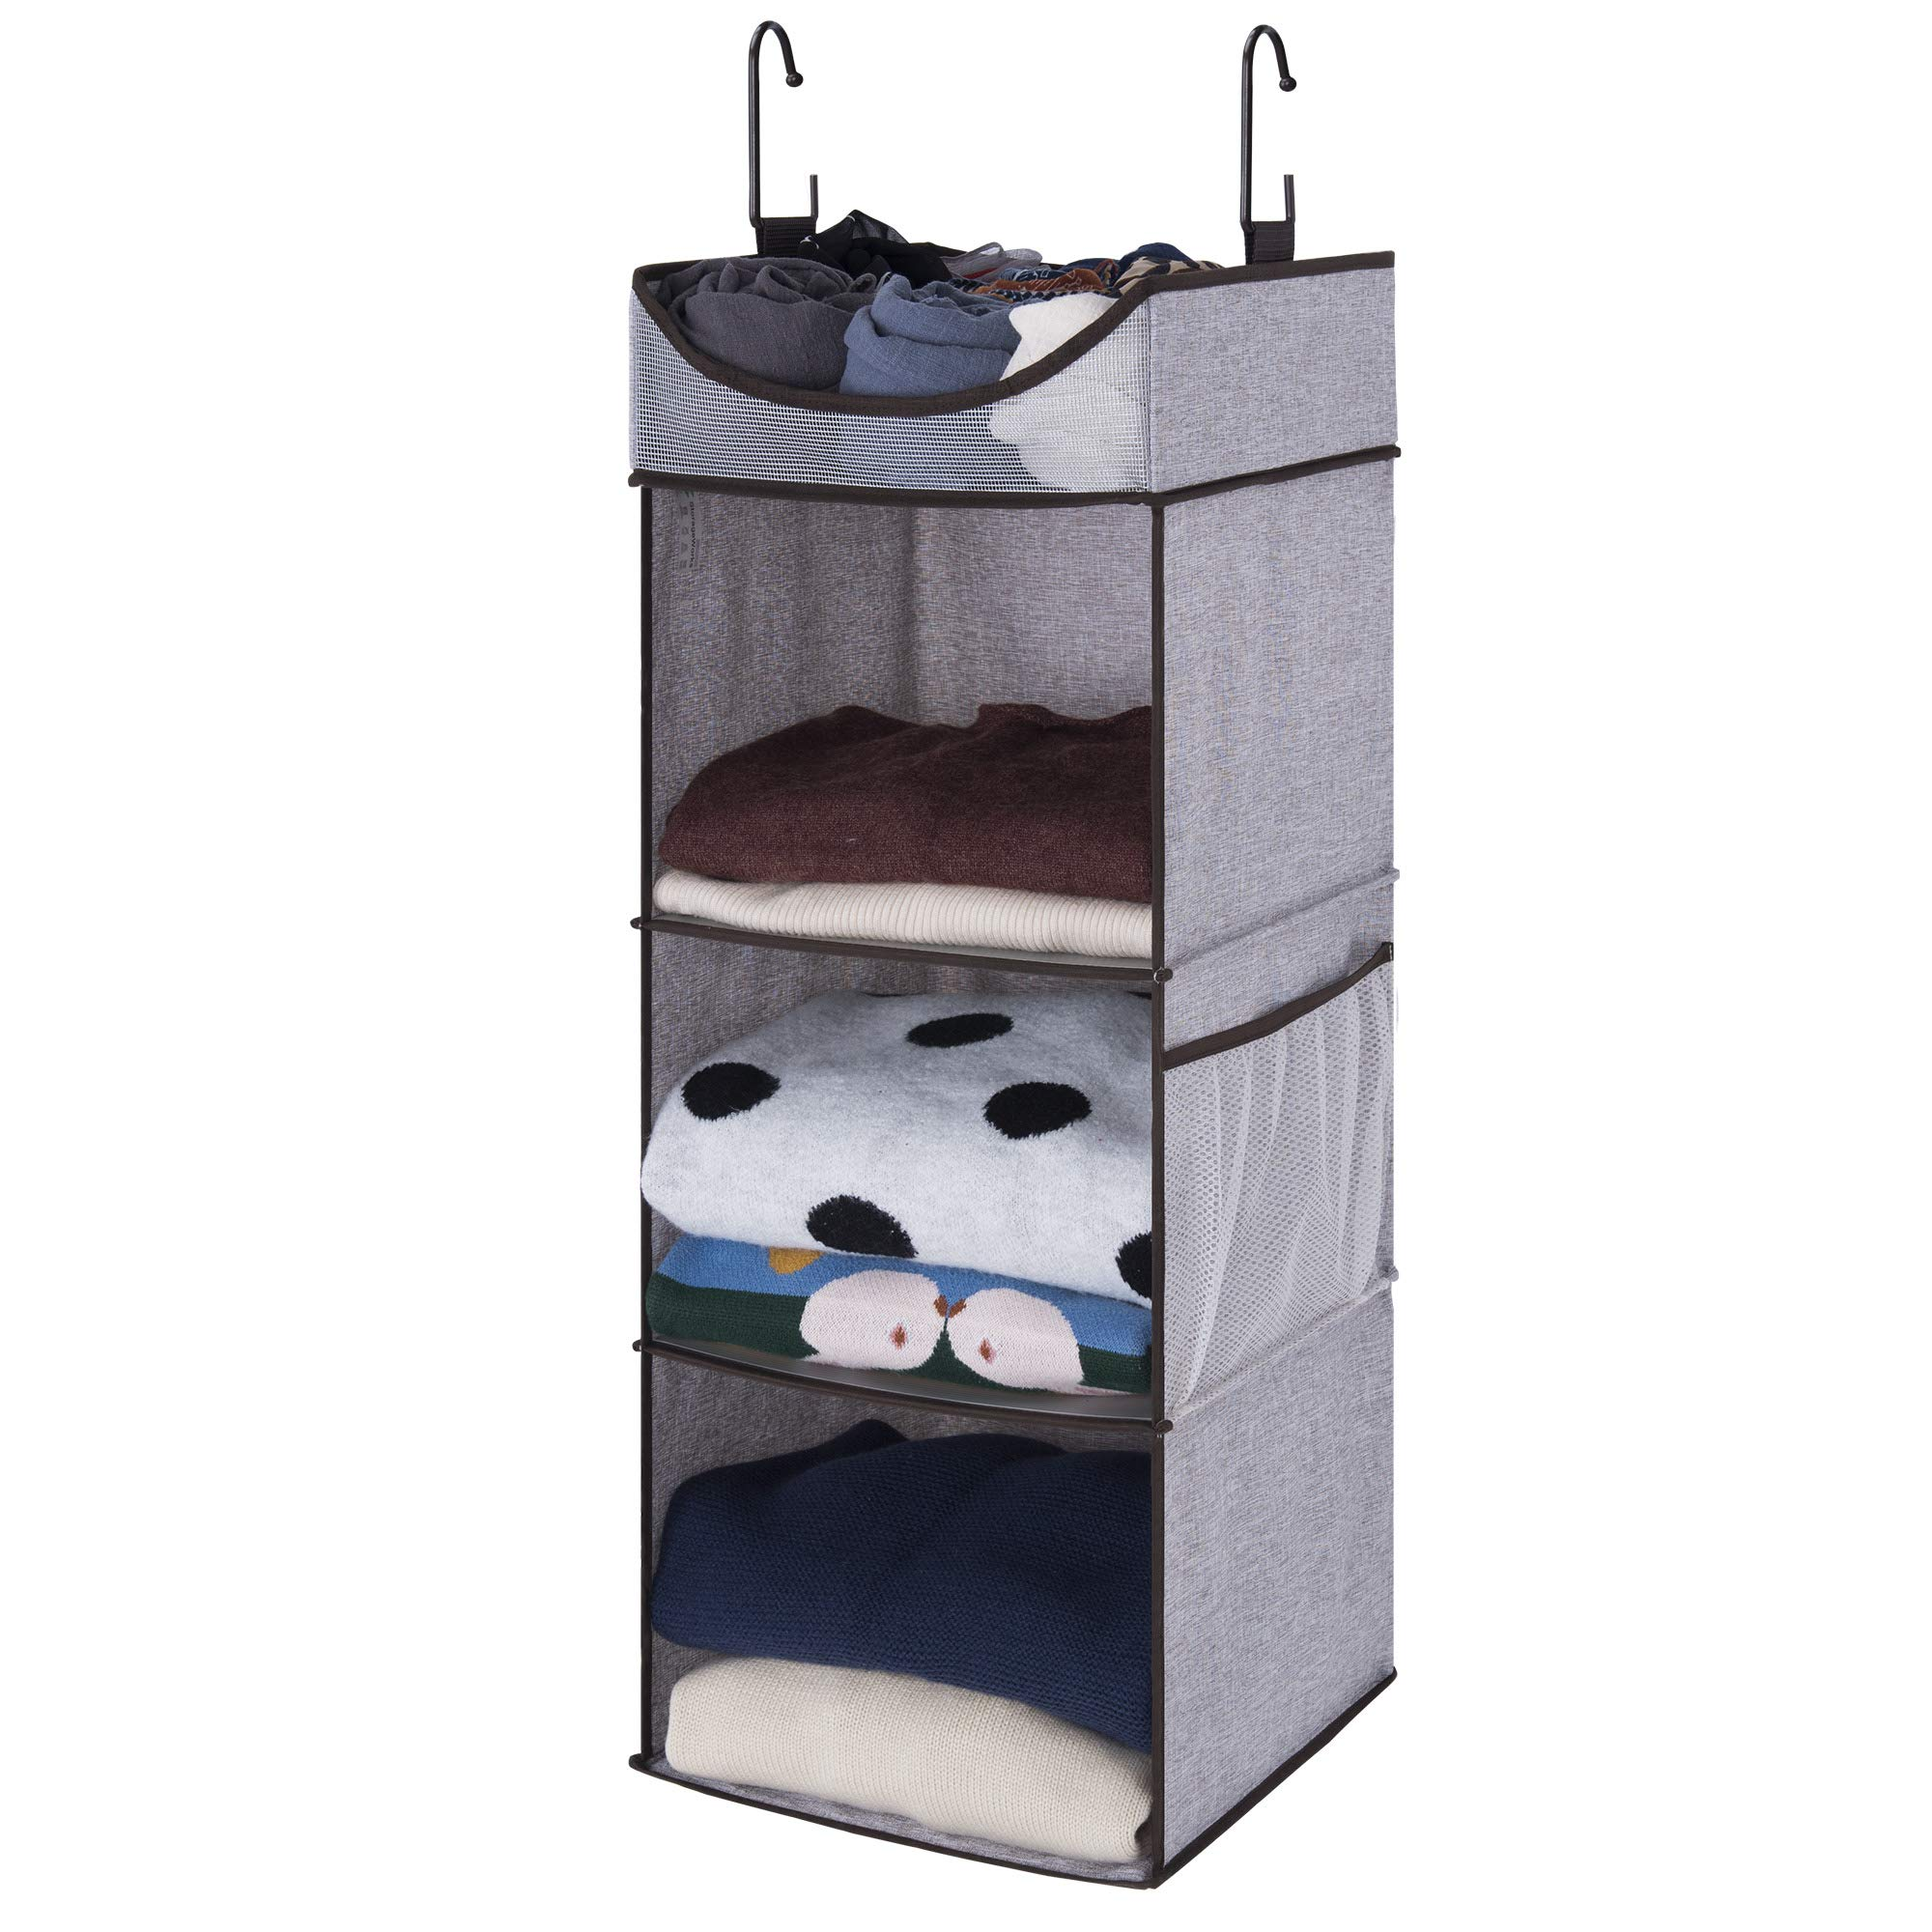 StorageWorks Hanging Closet Organizer Extra Large